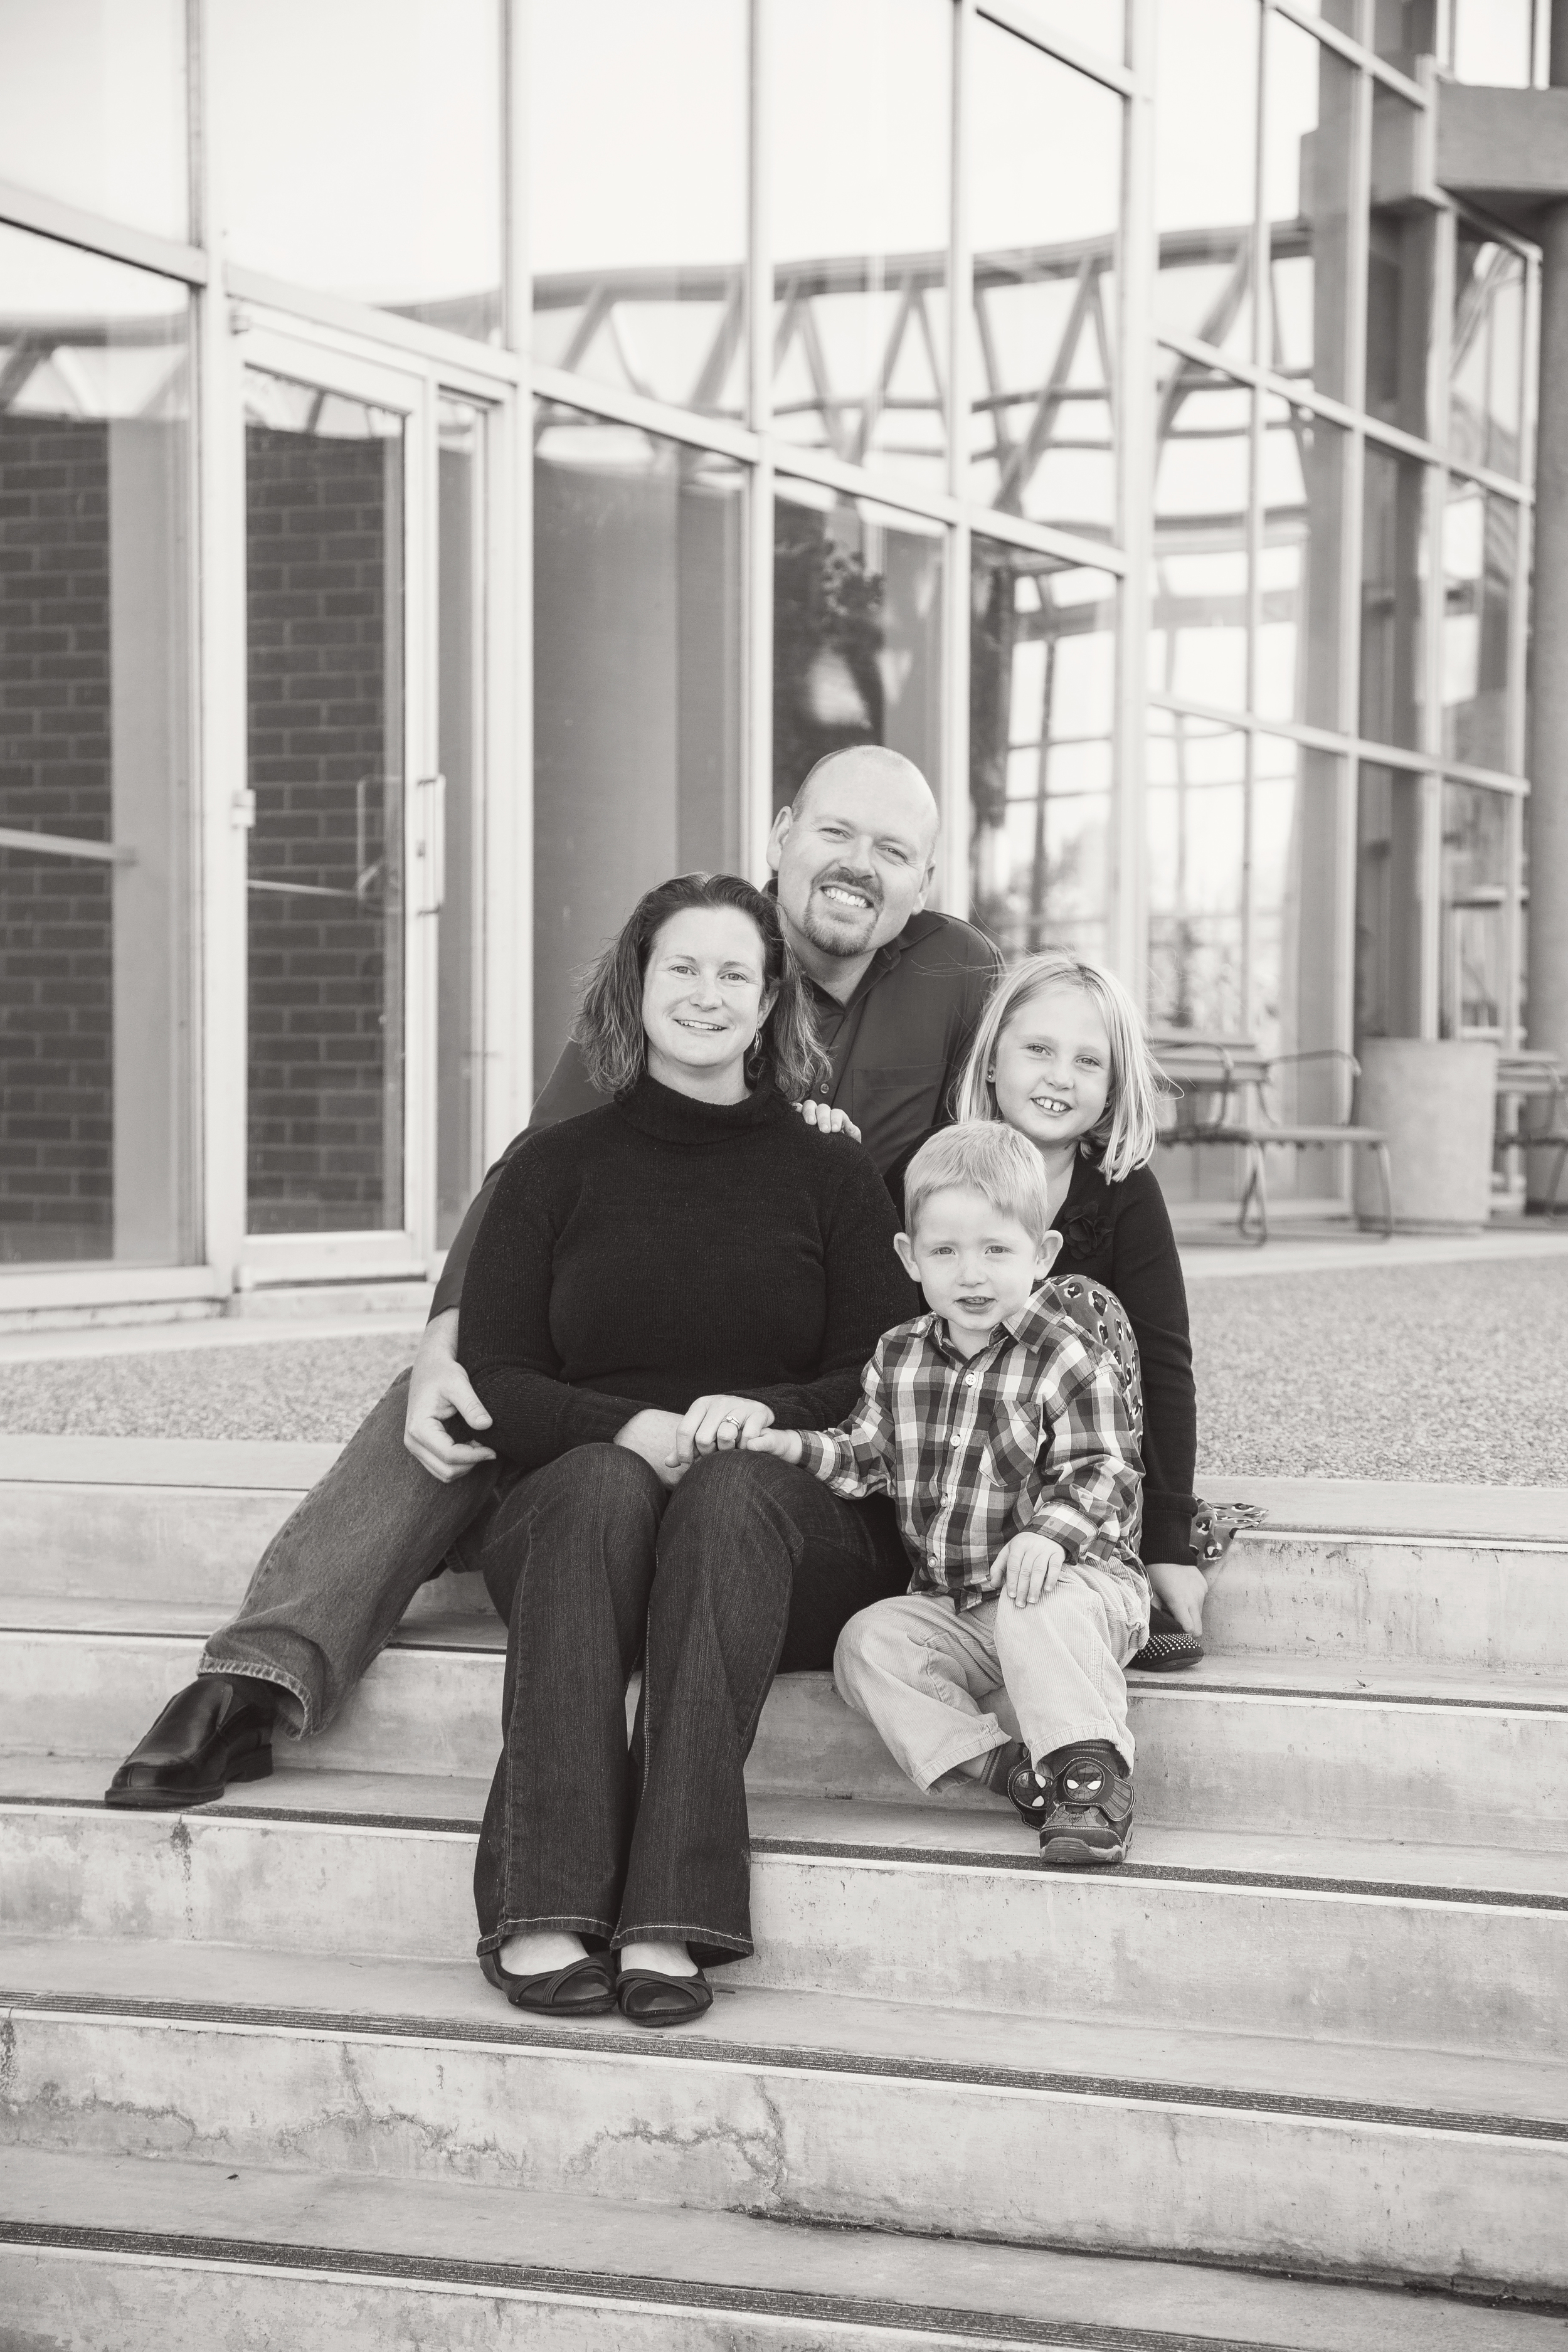 Family_Photos_2014_002_bw.jpg